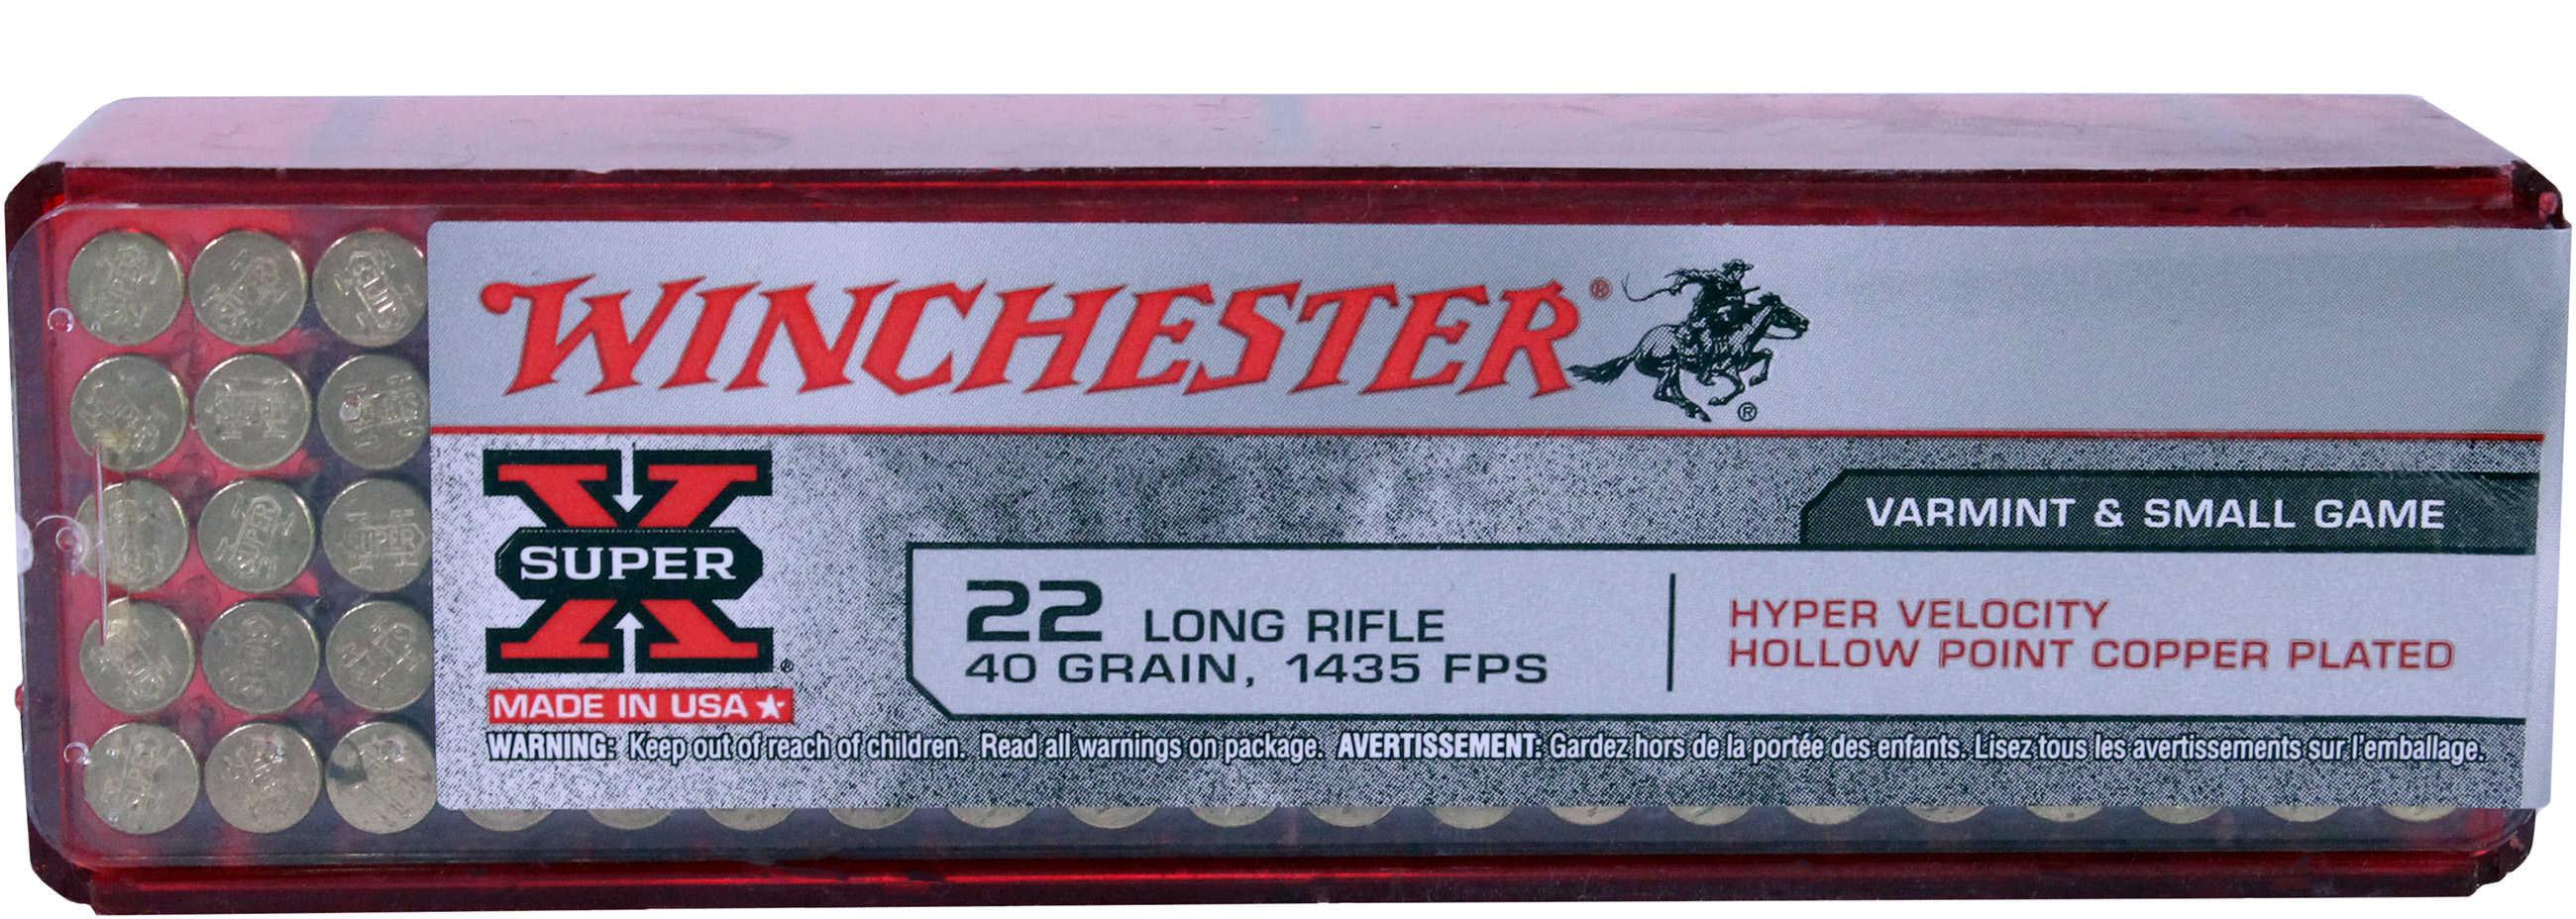 Winchester Ammunition High Velocity 22LR 40 Grain Plated Hollow Point 100 Round Box XHV22LR